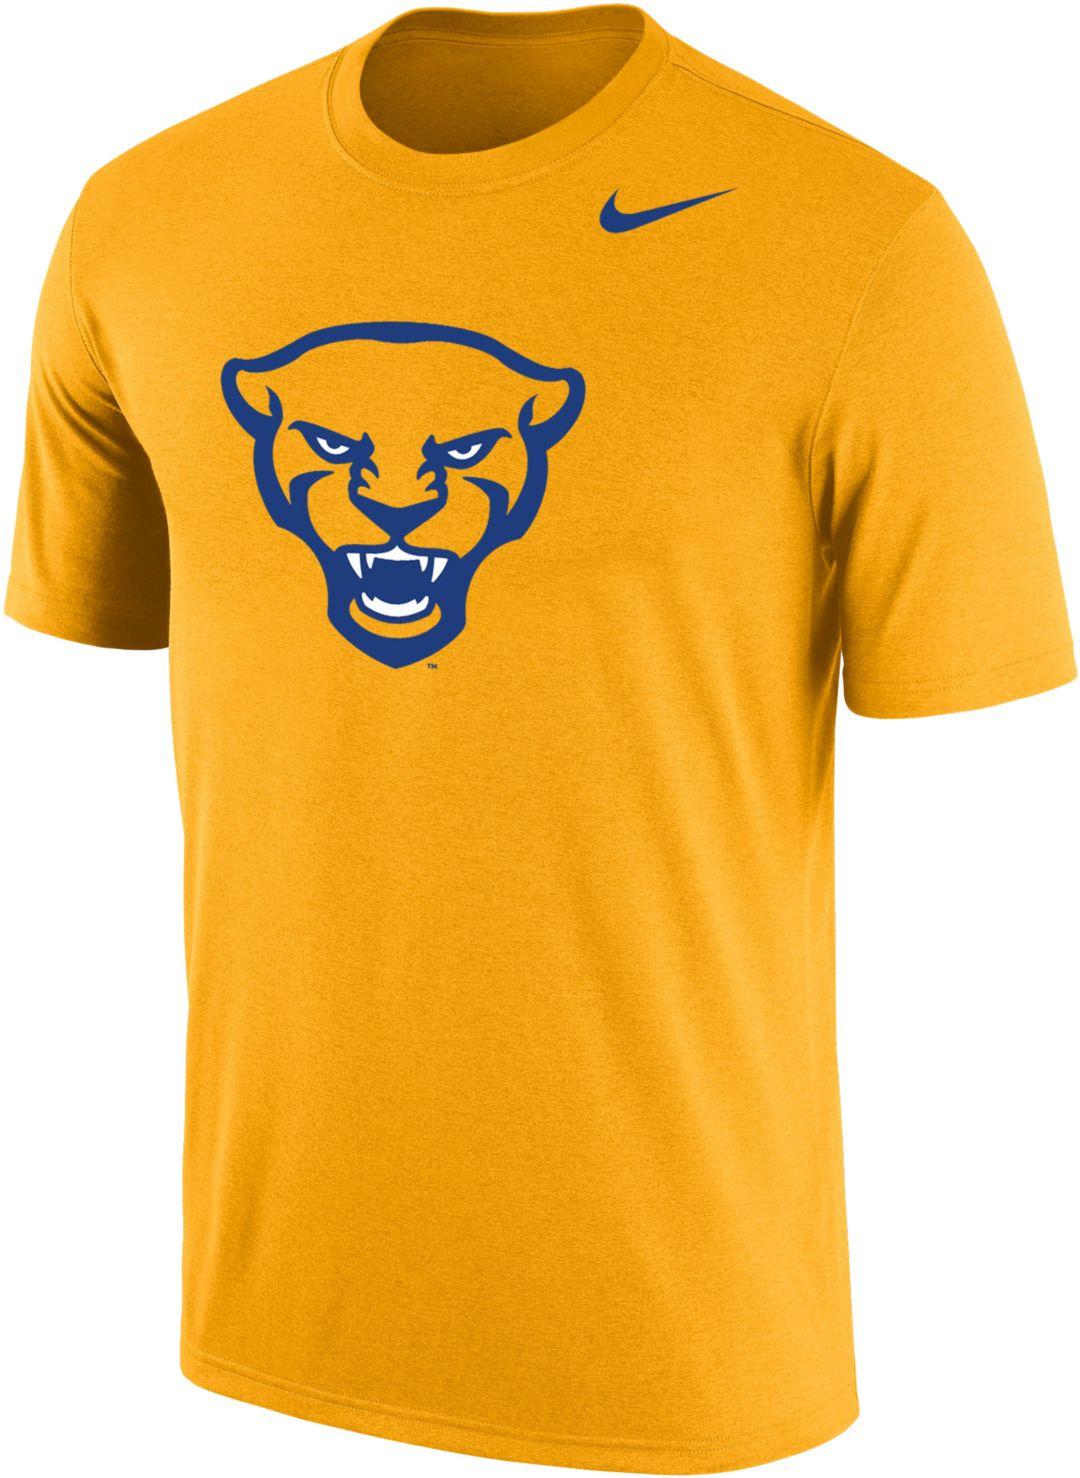 830dad09 Nike Men's Pitt Panthers Gold Panther Head Logo Dri-FIT Cotton T-Shirt.  noImageFound. 1